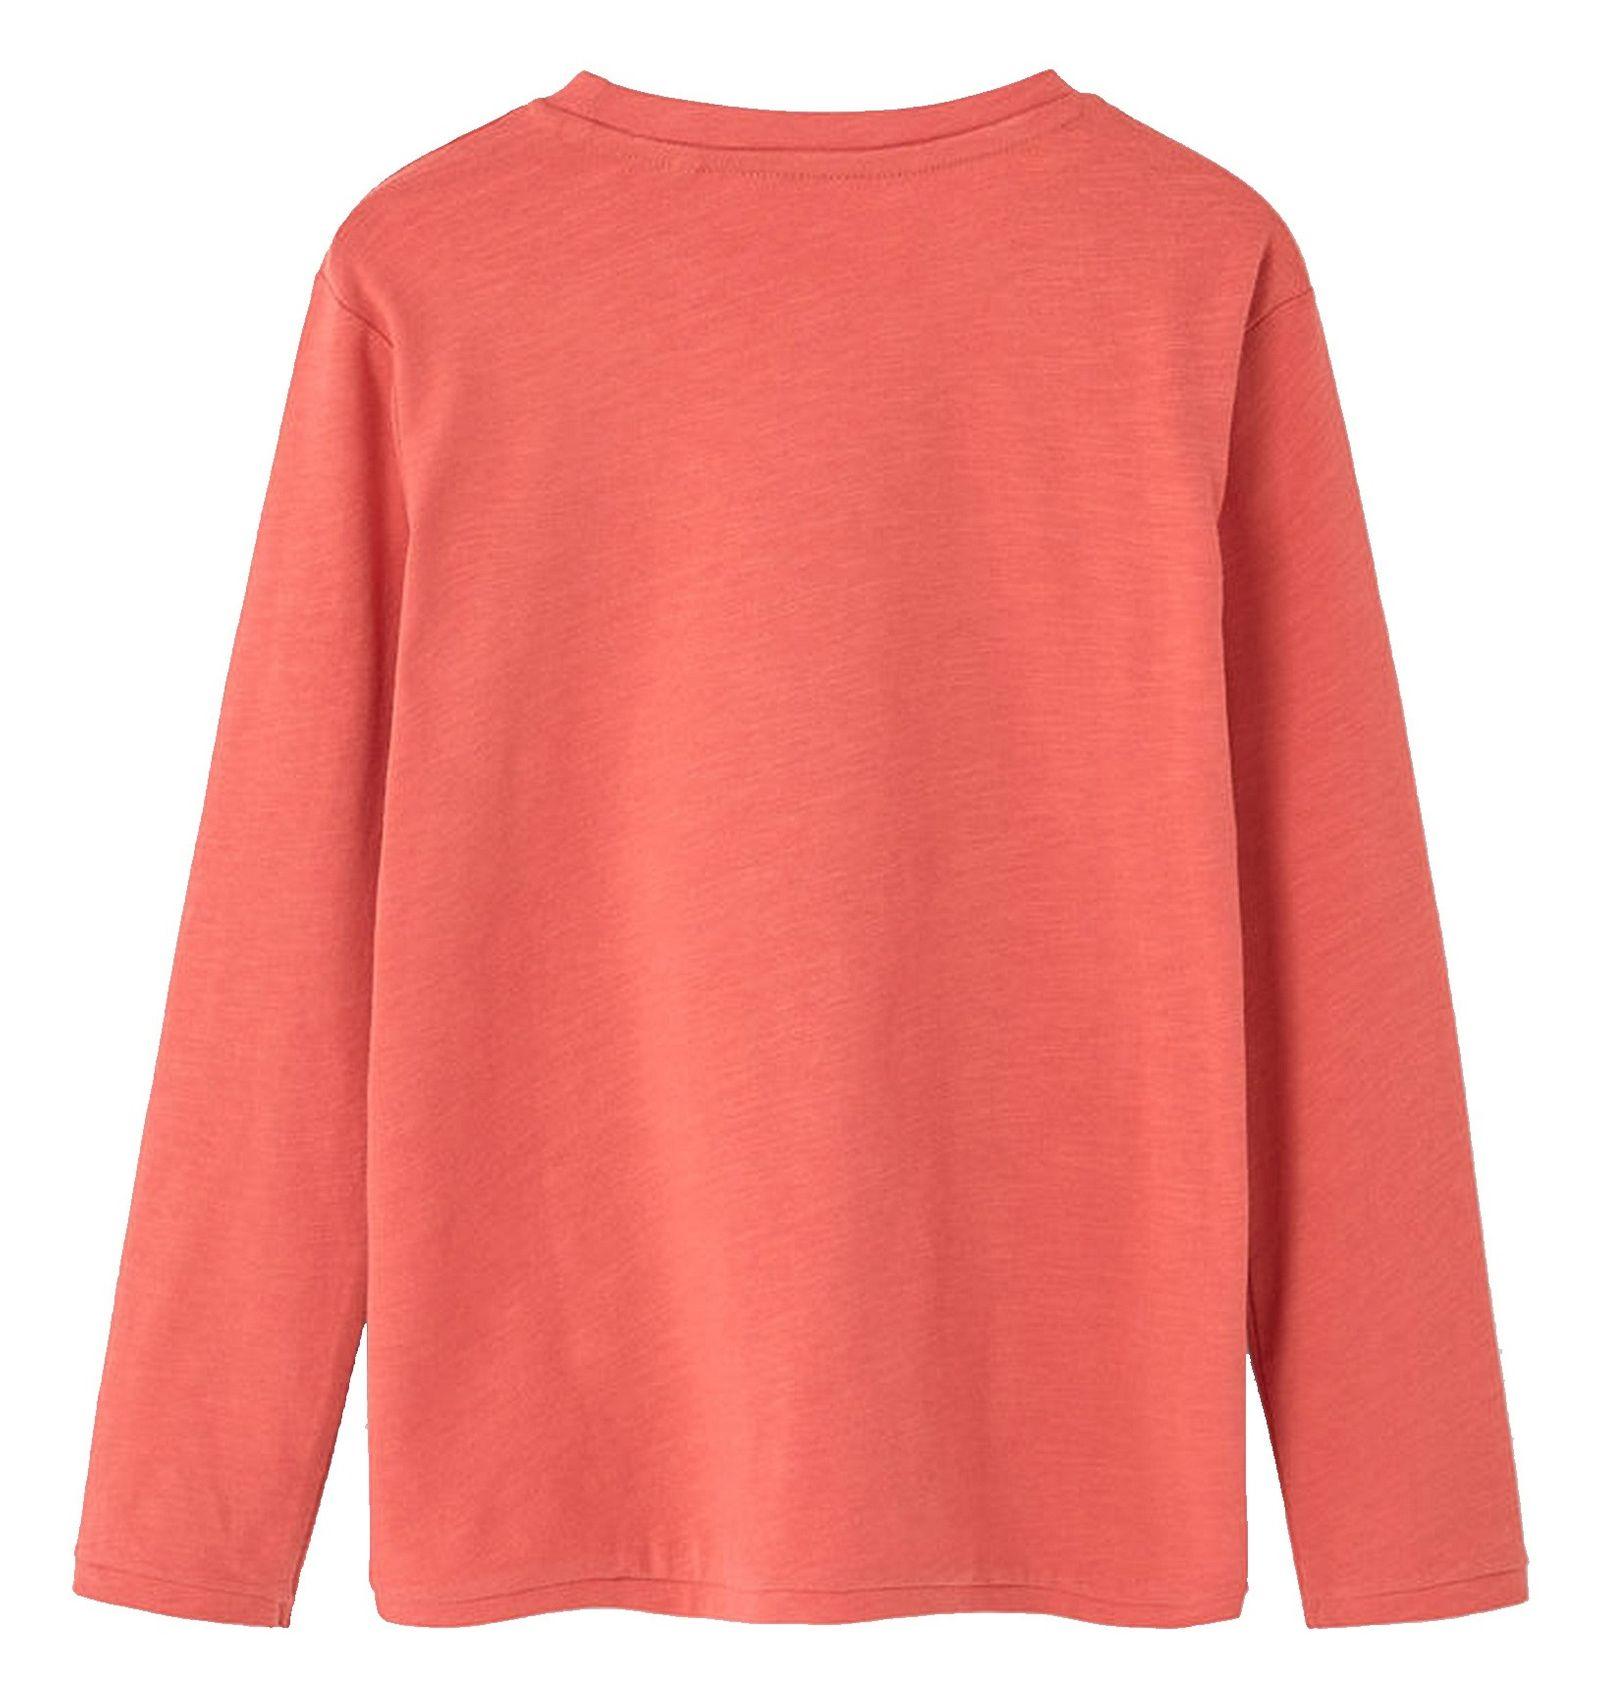 تی شرت نخی پسرانه - مانگو -  - 2